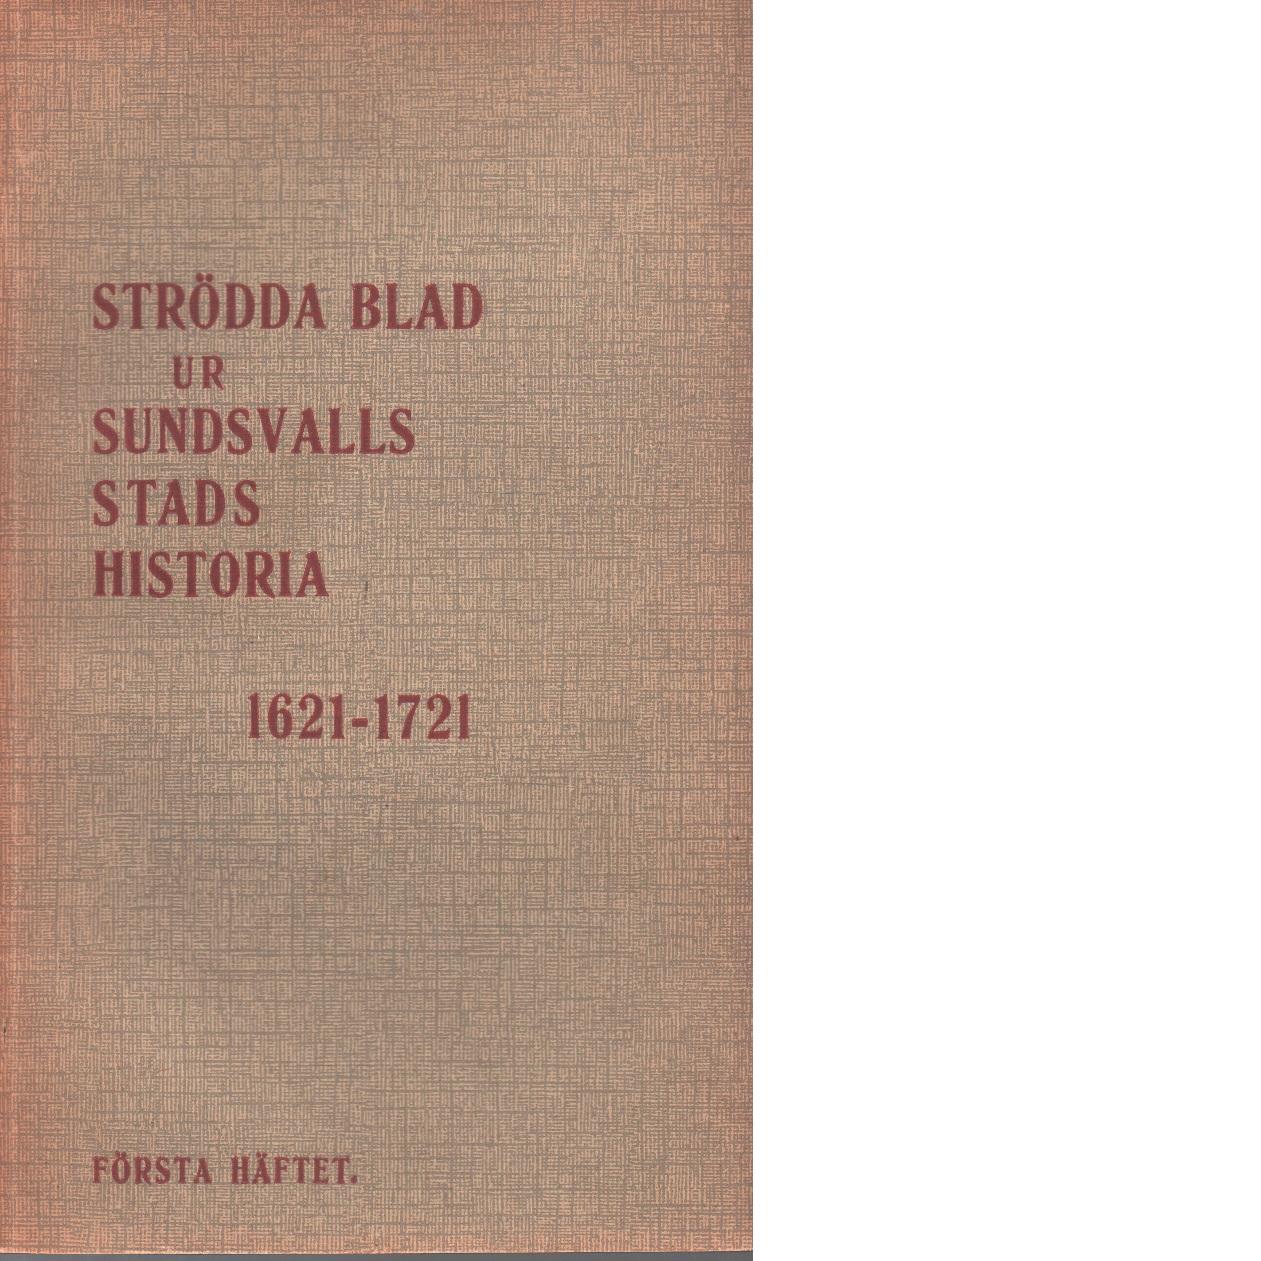 Strödda blad ur sundsvalls stads historia : 1621-1721. h. 1 - Sandeberg, Svante Af